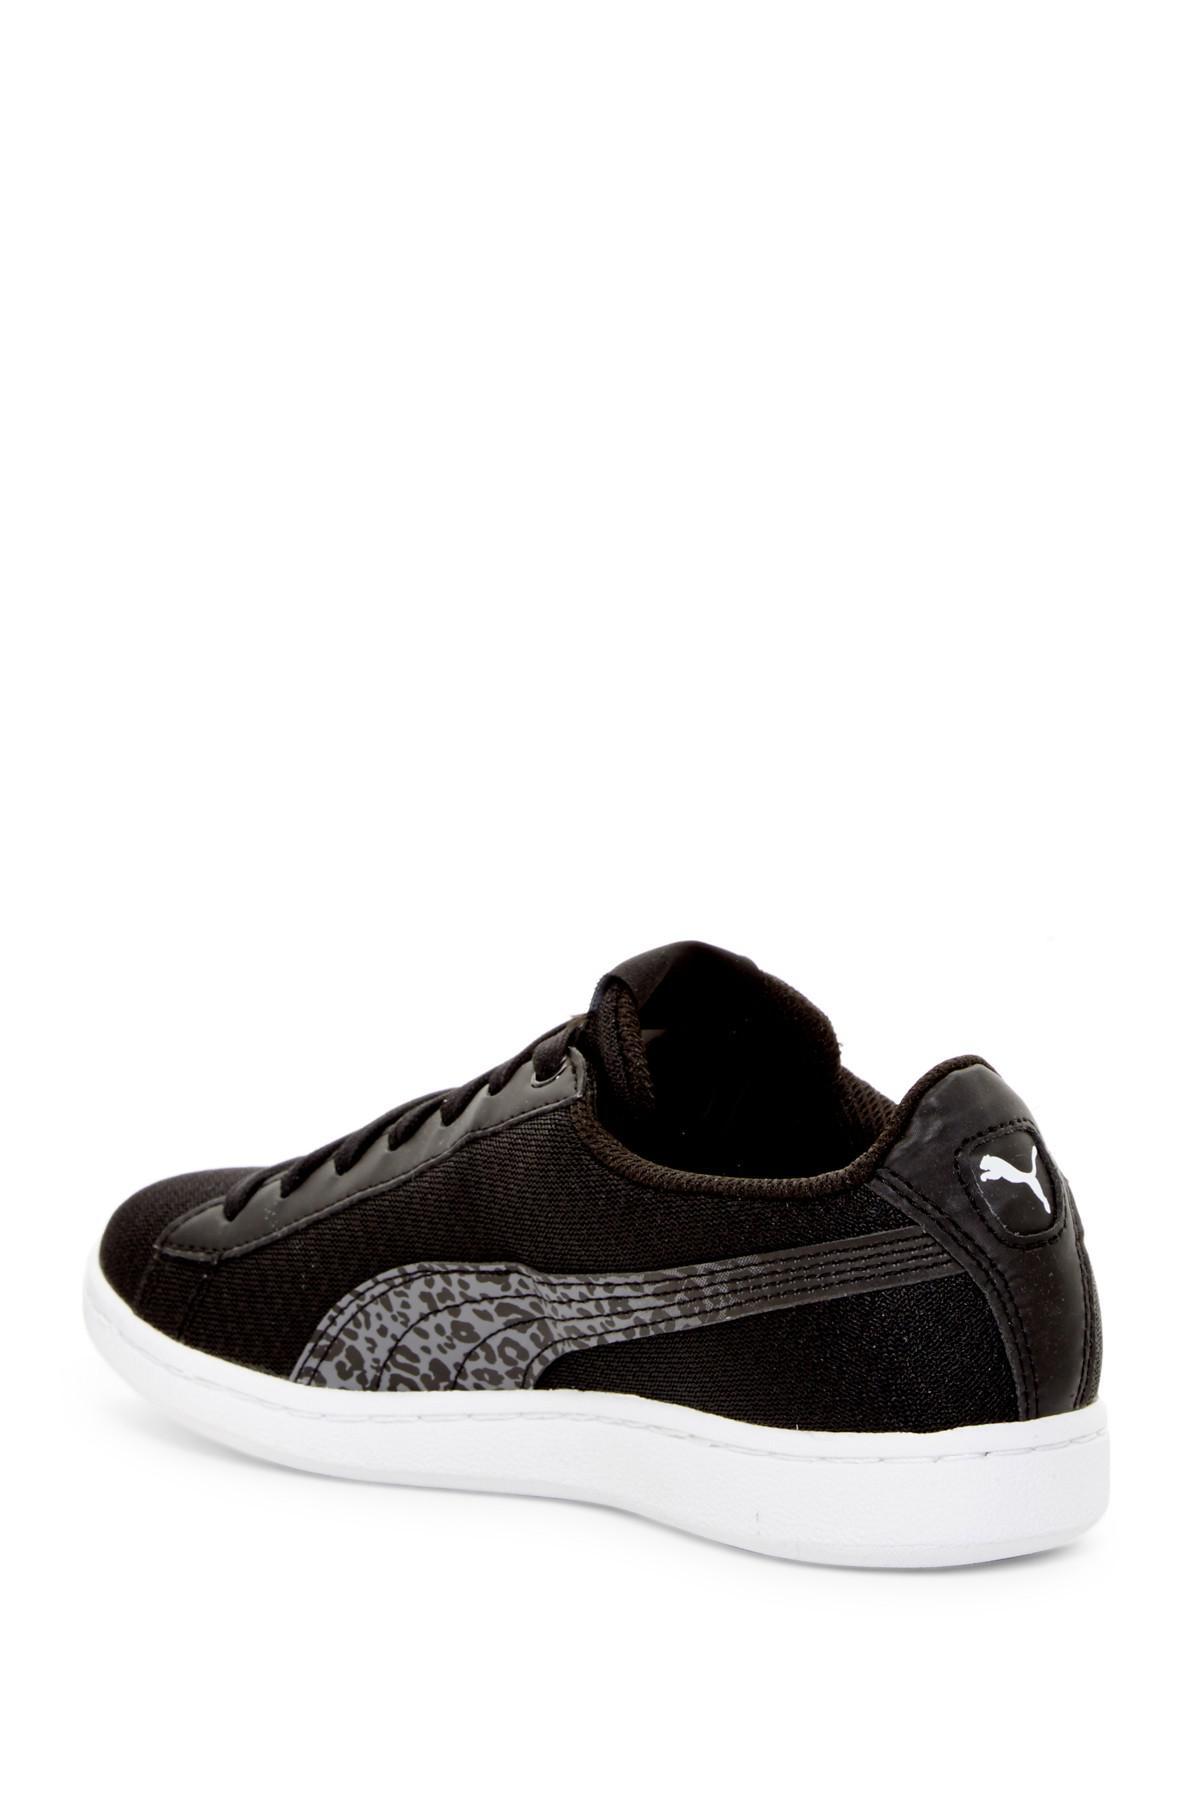 Lyst - PUMA Vikky Leopard Print Sneaker in Black for Men 9c2b4ca5263d